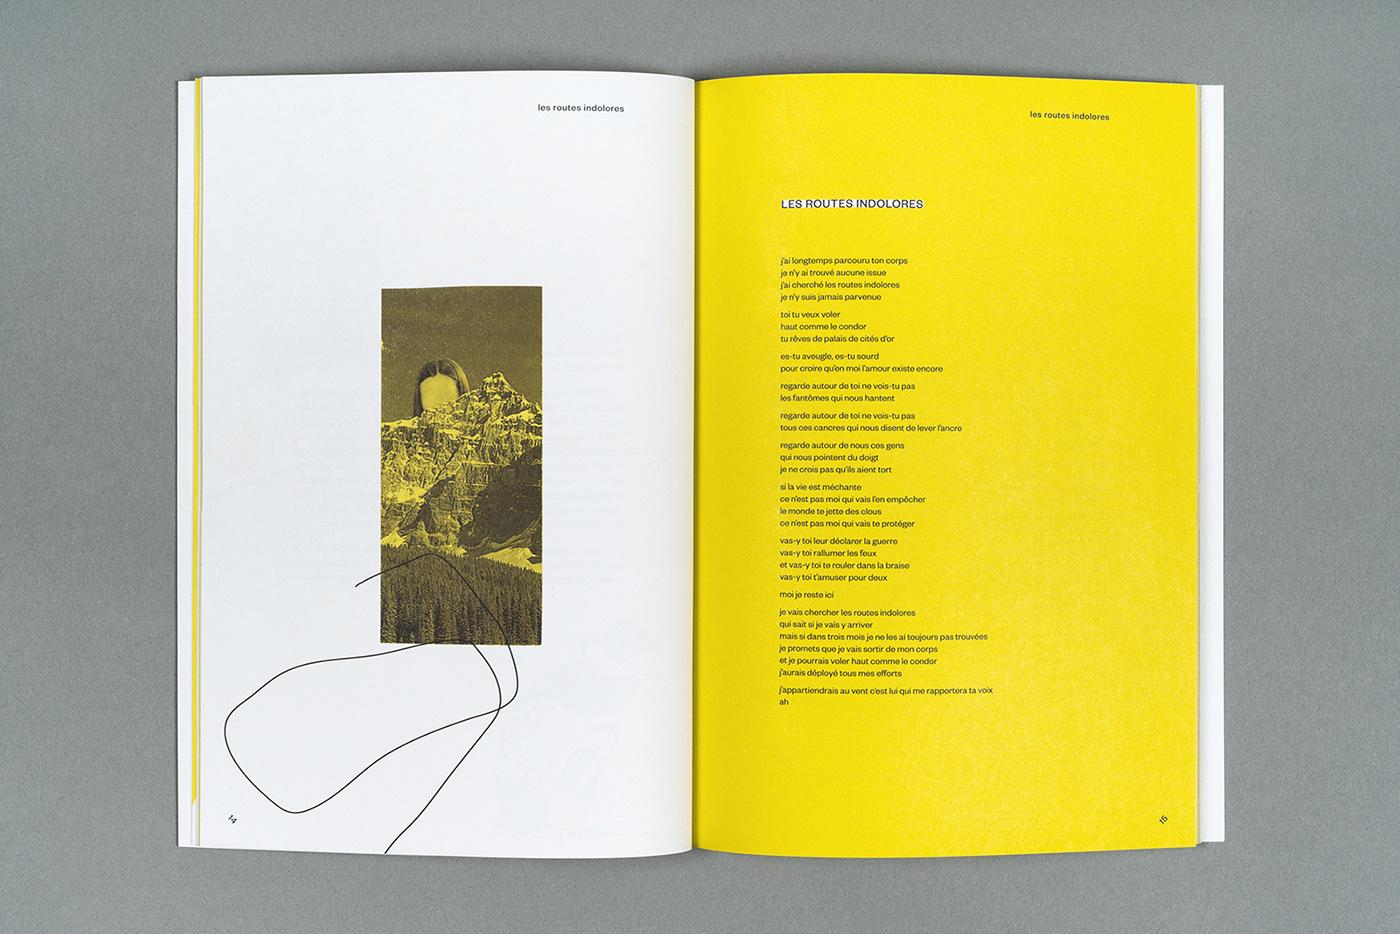 Album,vinyle,music,Montreal,albumart,Zine ,Booklet,book,yellow,collage